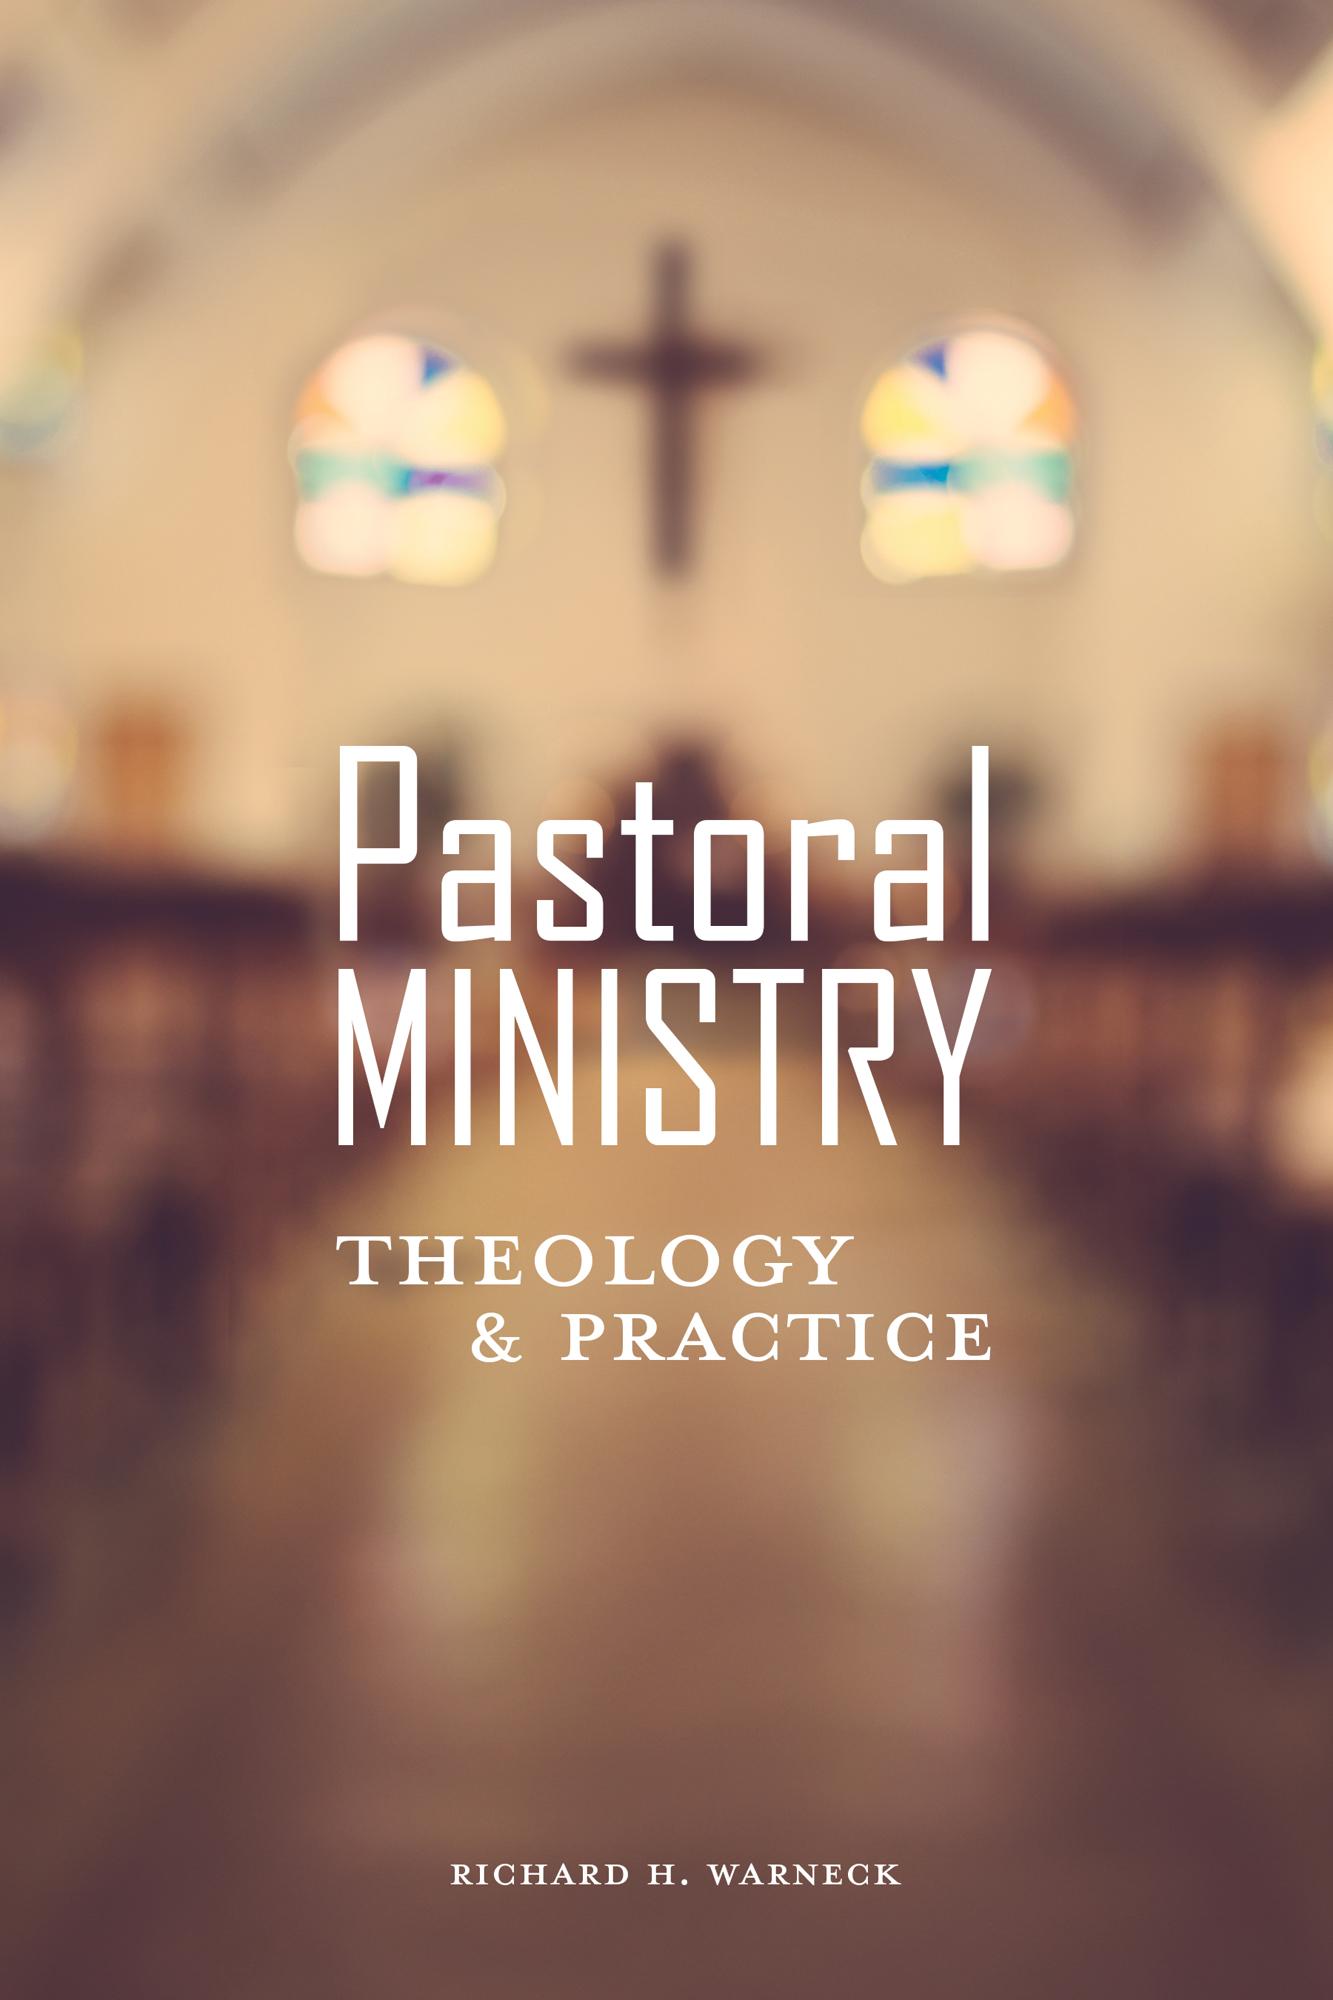 Book Blurbs: Richard Warneck on Pastoral Ministry